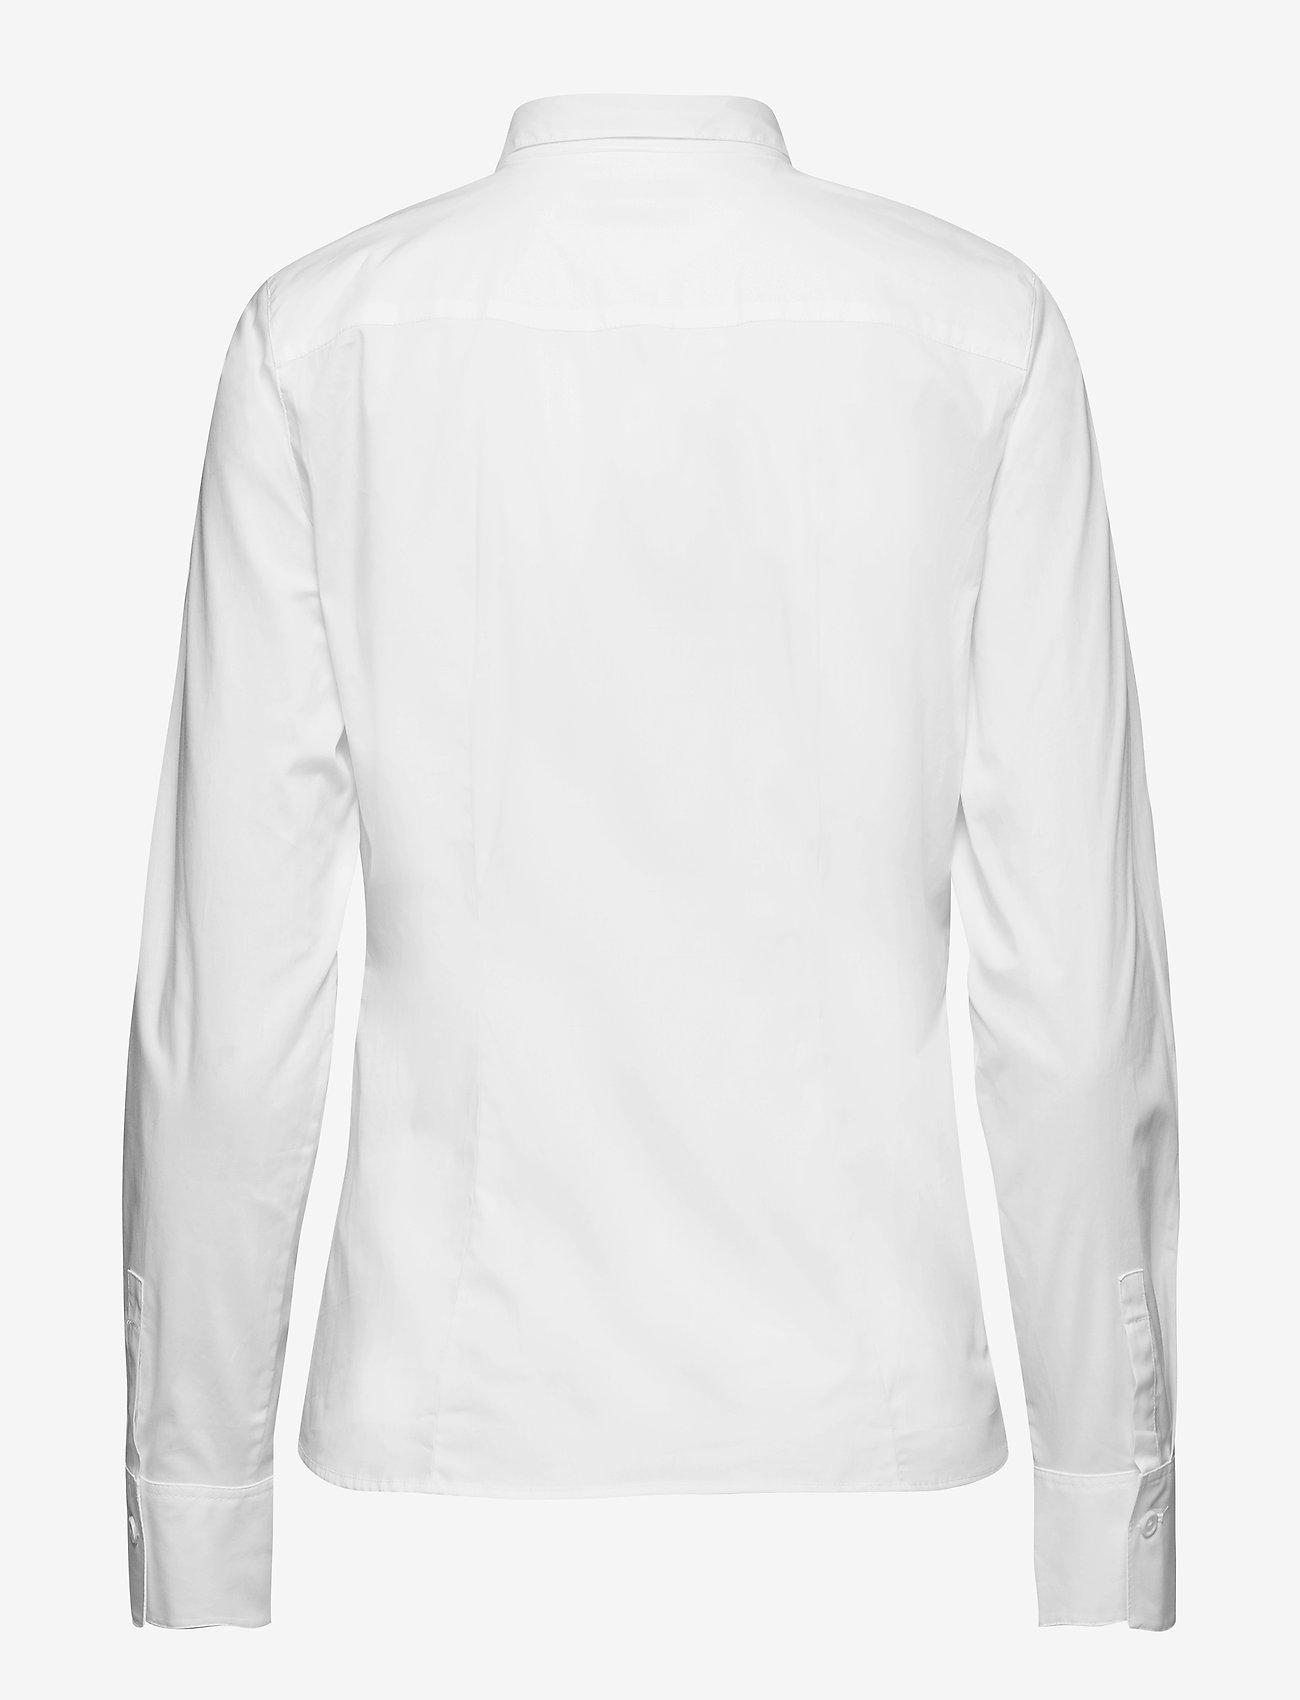 Marc O'Polo - SHIRTS/BLOUSES LONG SLEEVE - langærmede skjorter - white - 1